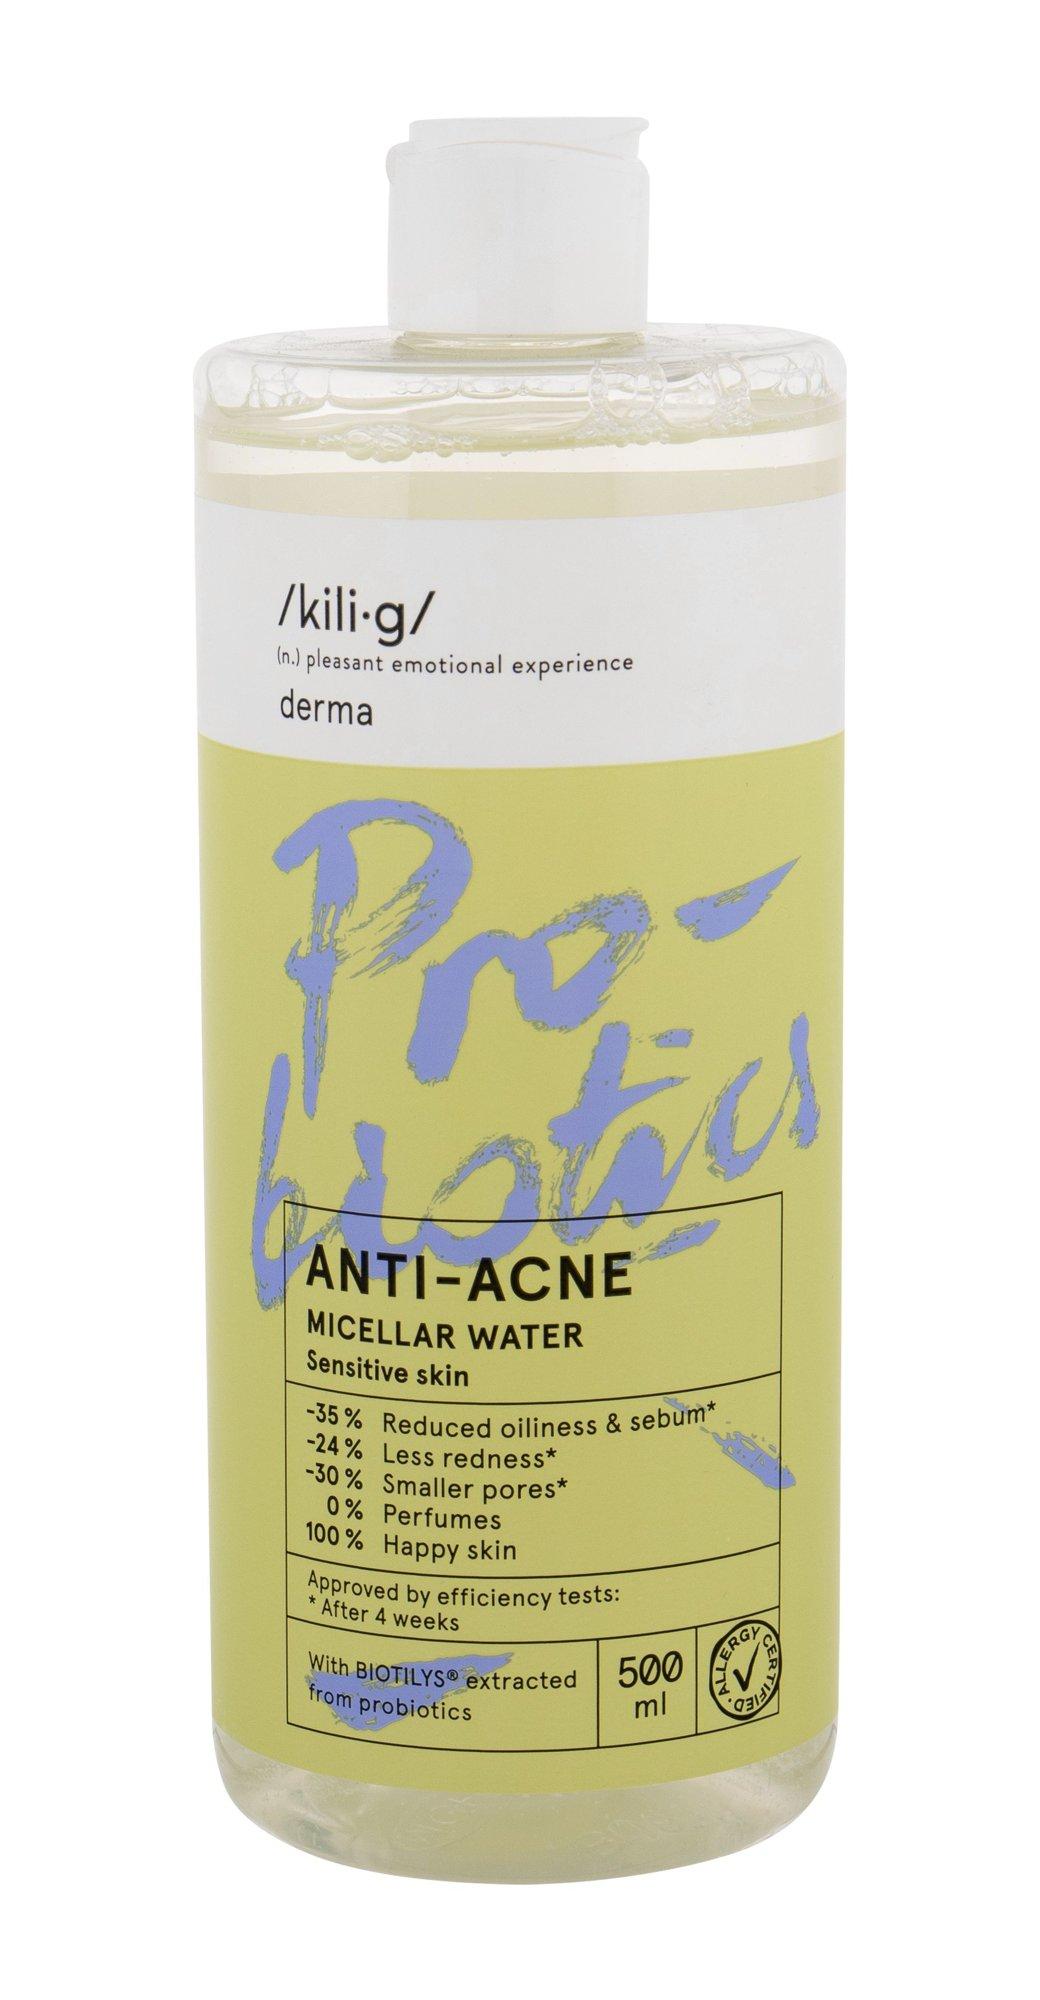 kili·g derma Micellar Water 500ml  ANTI-ACNE